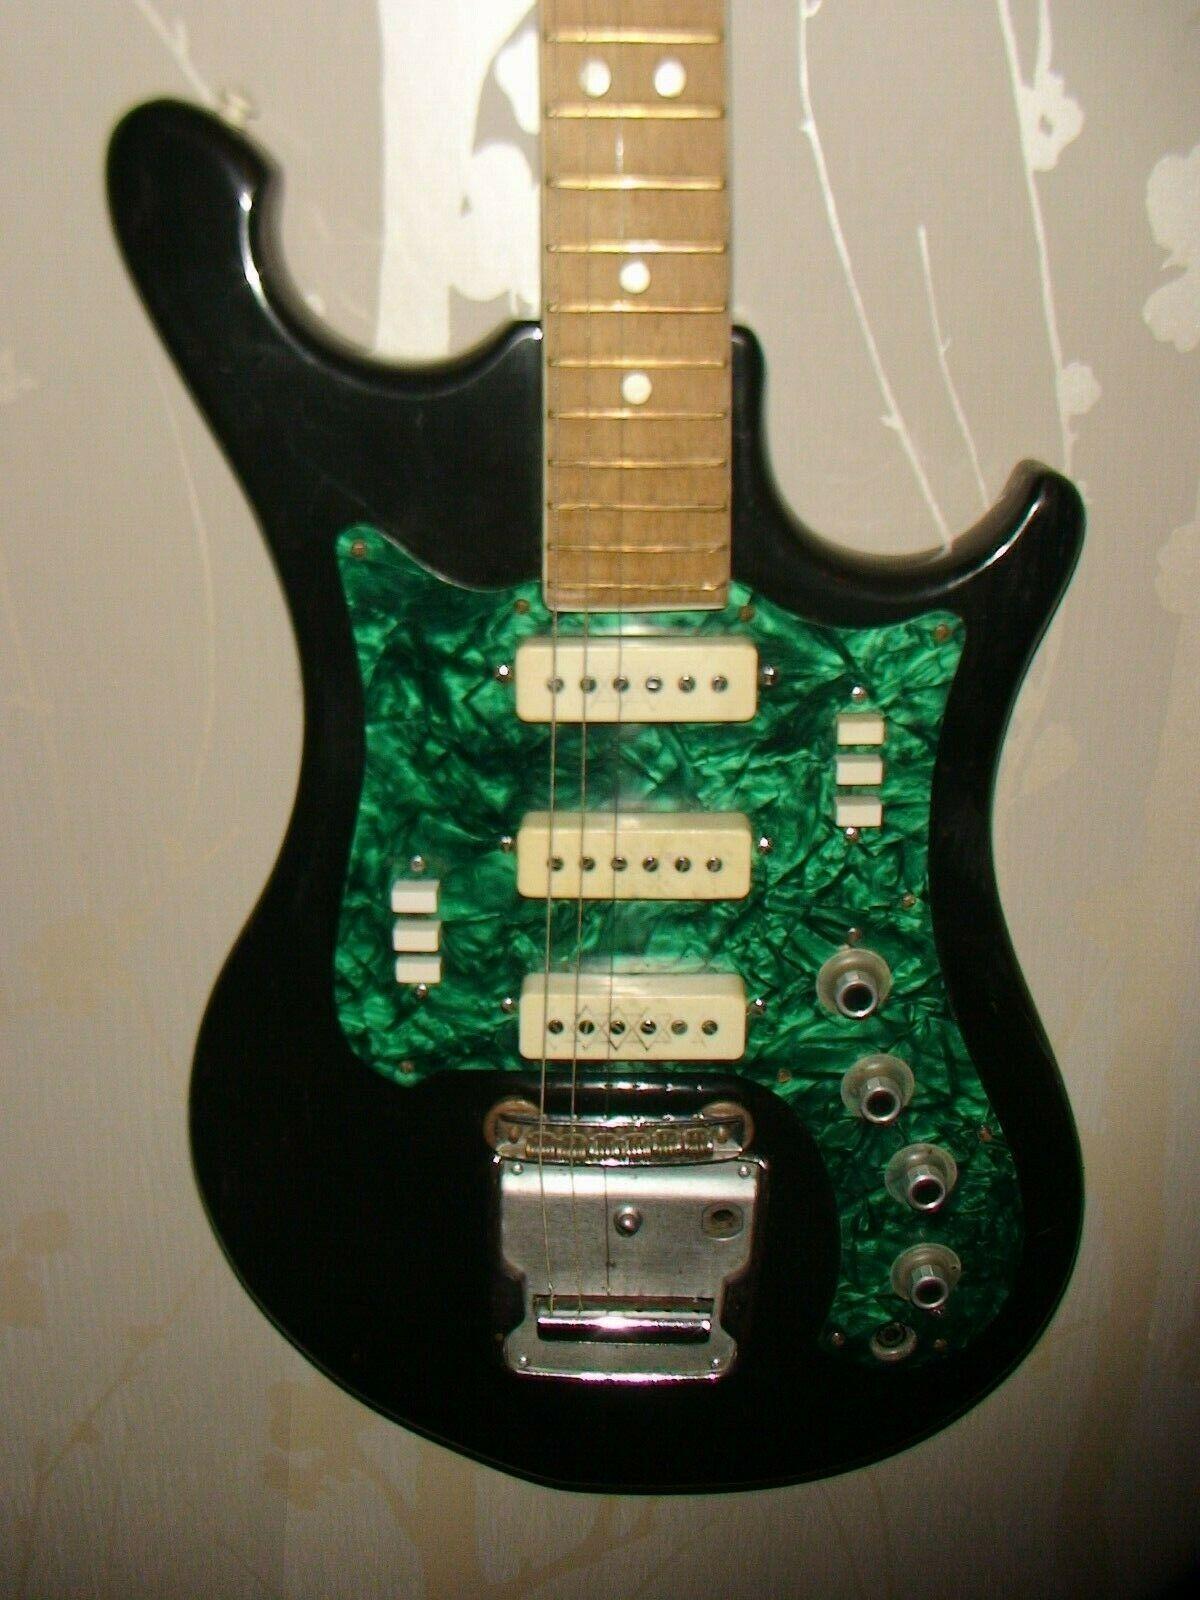 Ural 650 Electric Guitar Ussr Soviet Copy Yamaha Vintage Ebay In 2020 Guitar Electric Guitar Ussr